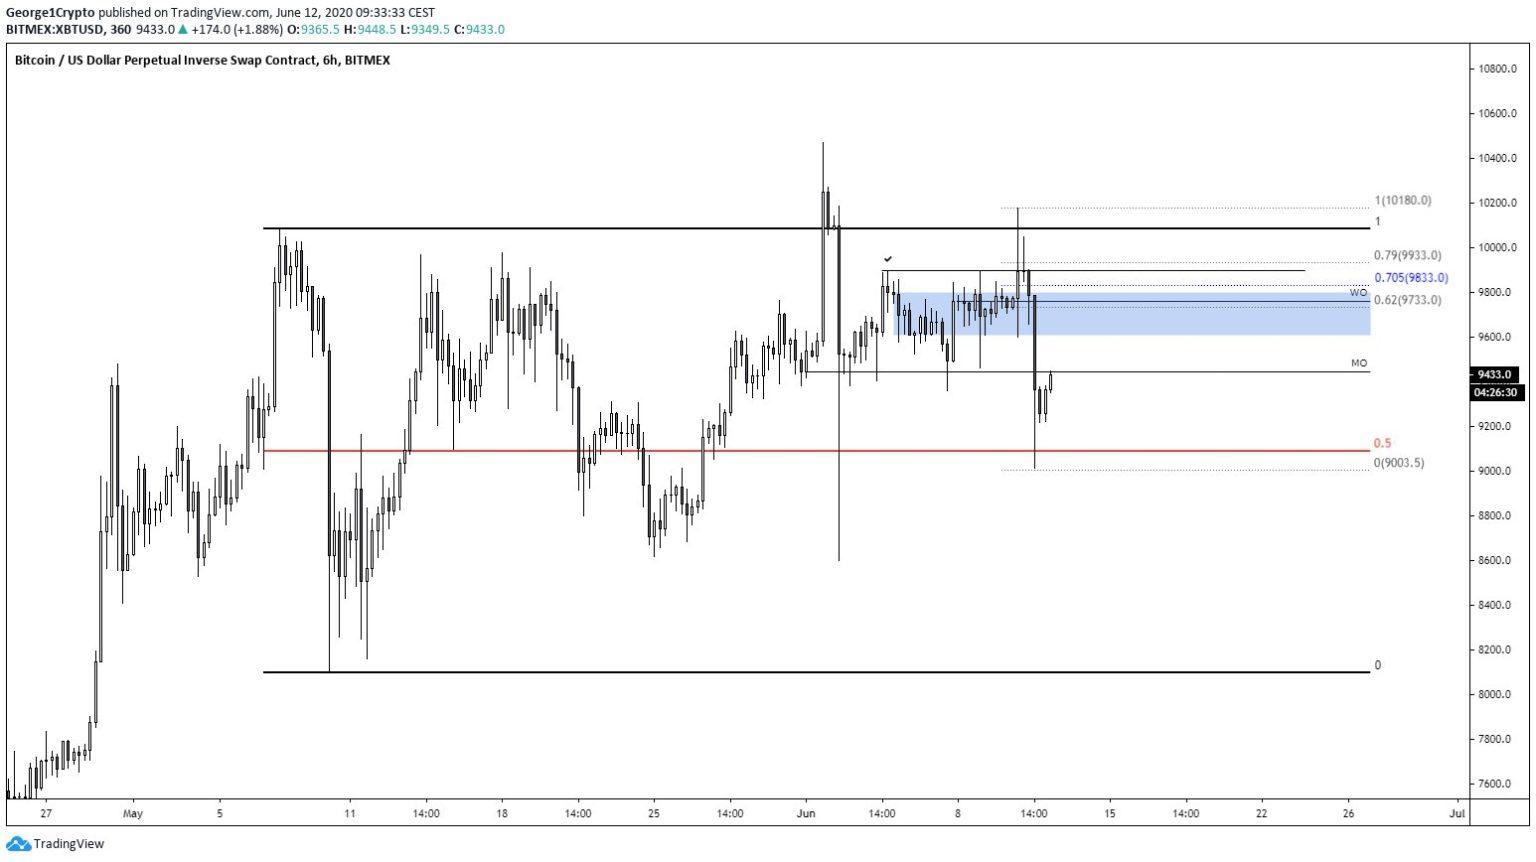 Bitcoin: George1Crypto auf Tradingview